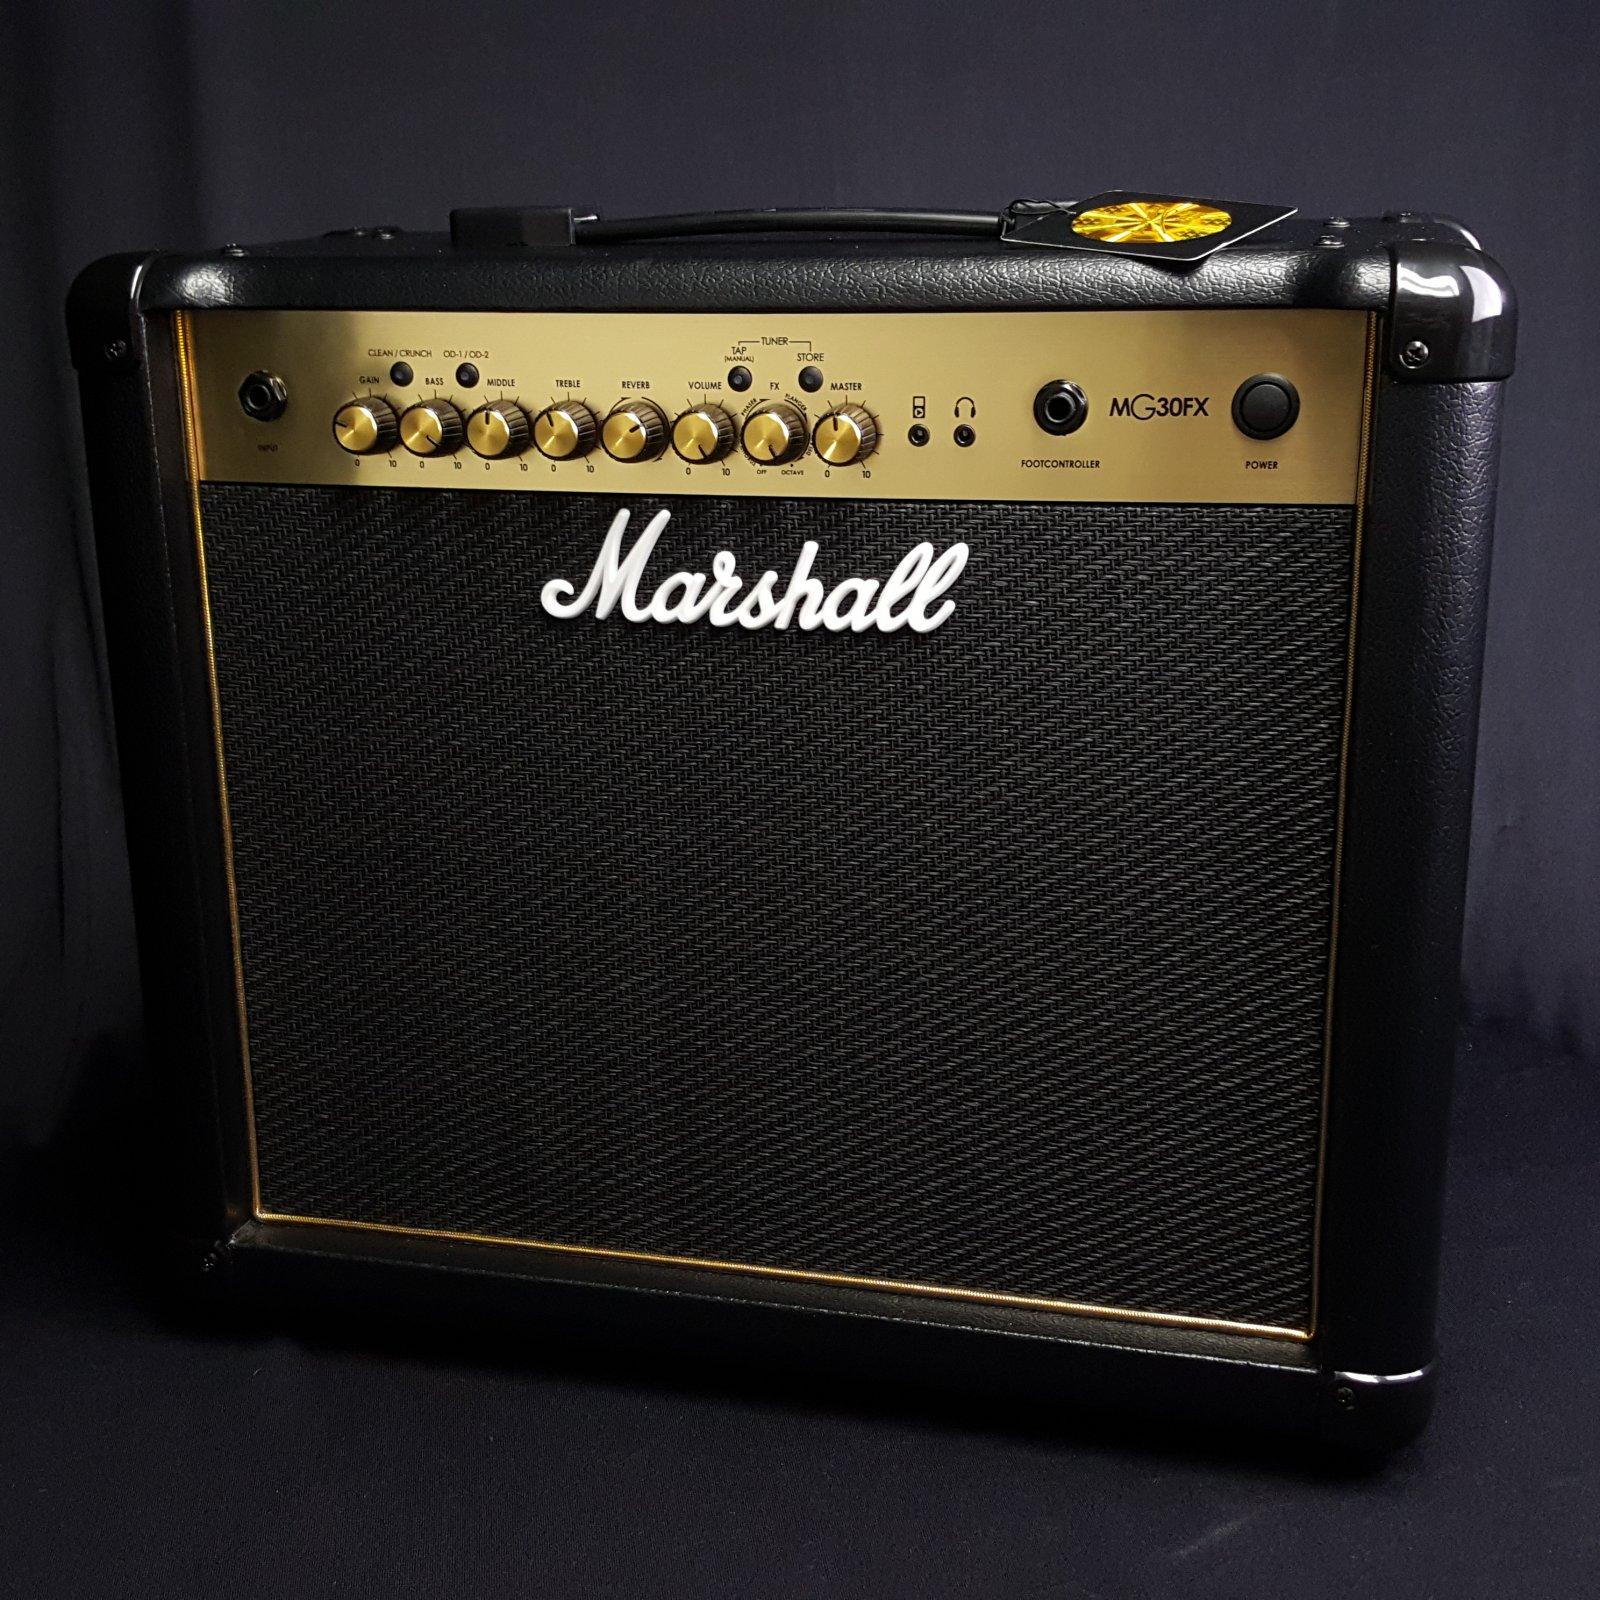 Marshall MG30FX 1 x 10 Combo Guitar Amplifier